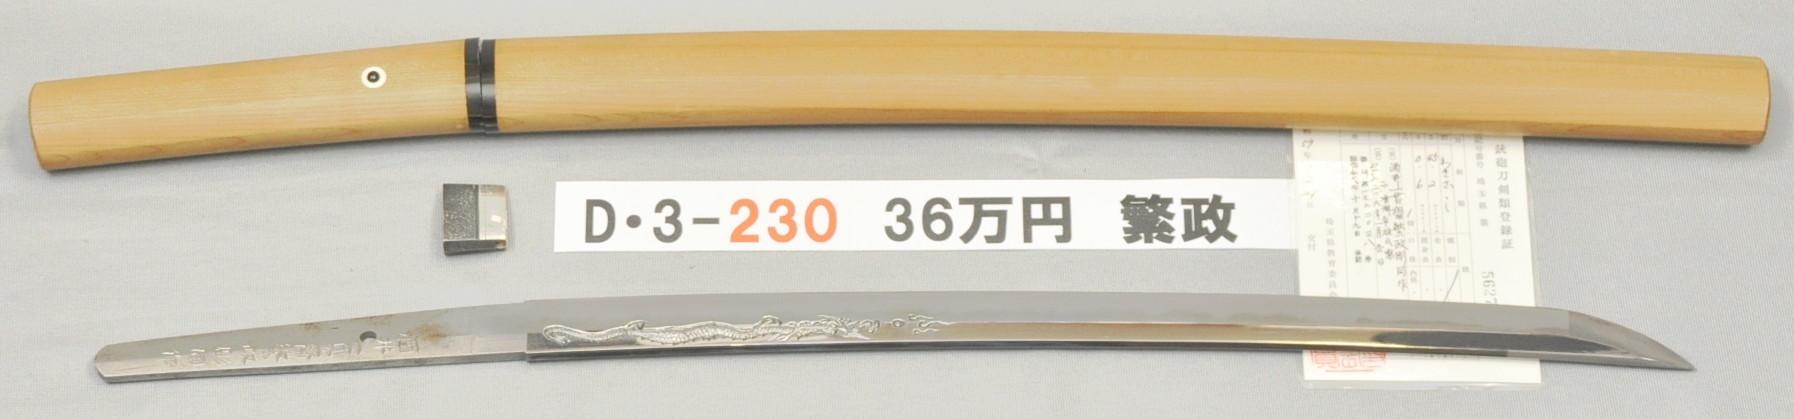 D3230